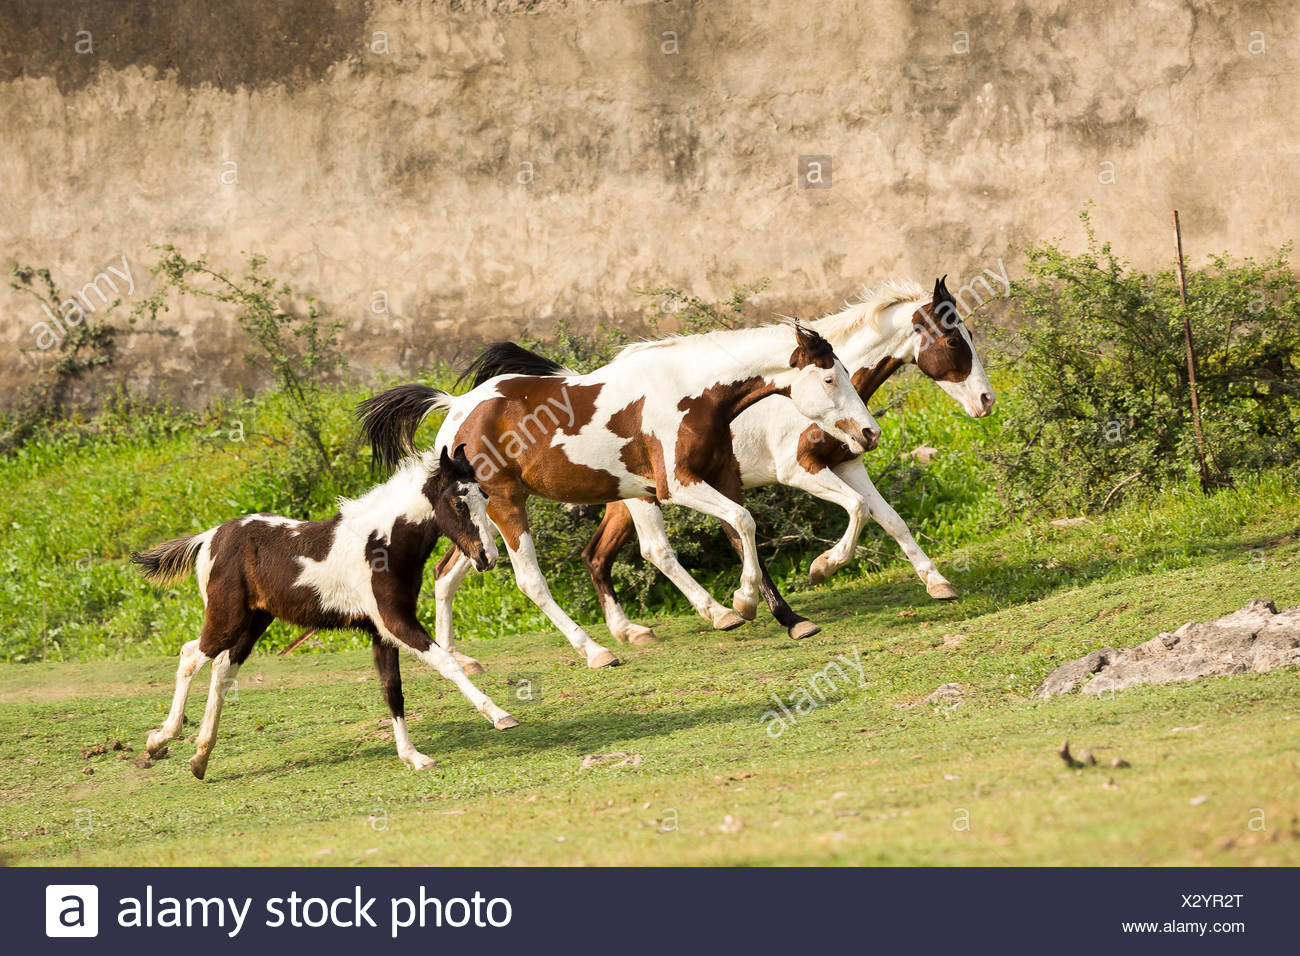 Marwari Horse. Trio di skewbald cavalli al galoppo sull'erba. Rajasthan, India Immagini Stock